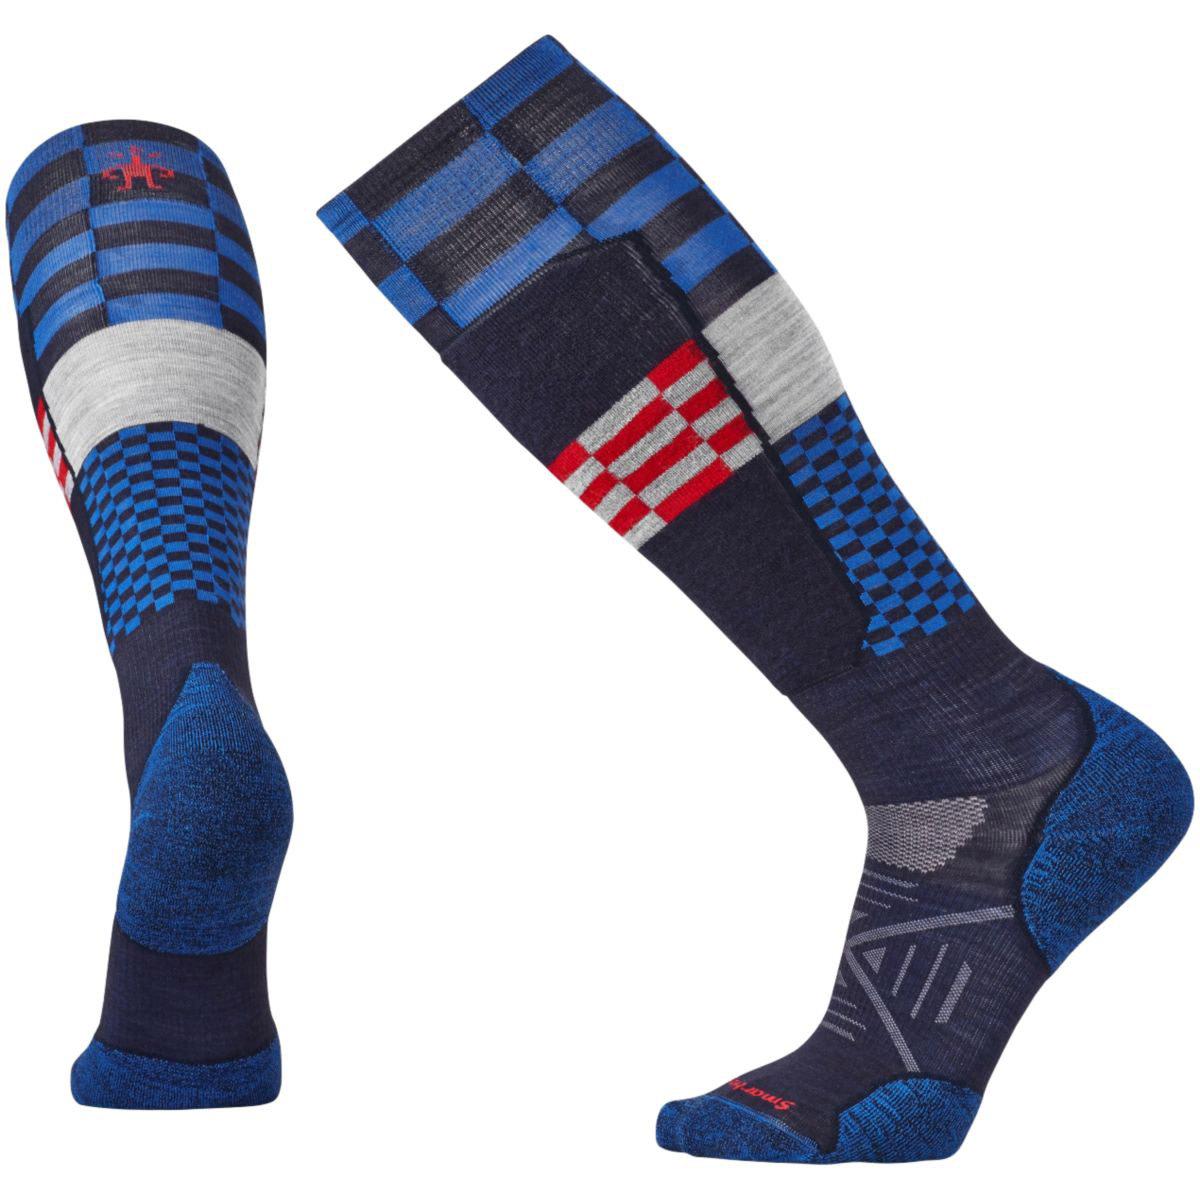 smartwool-socks_0.jpg